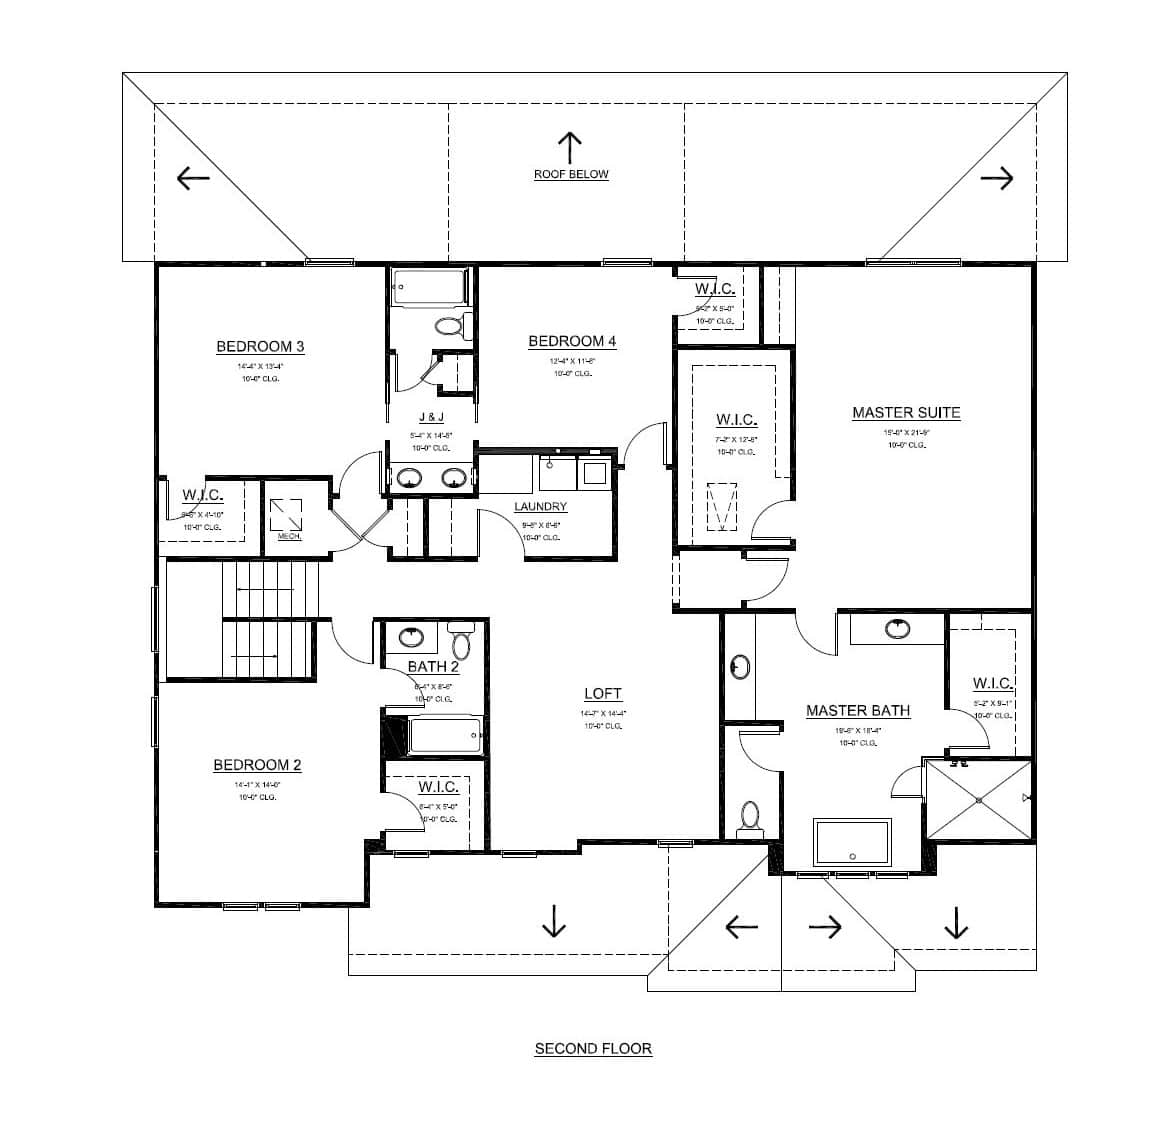 Signature homes floor plans st thomas turain signature homes for Signature home designs